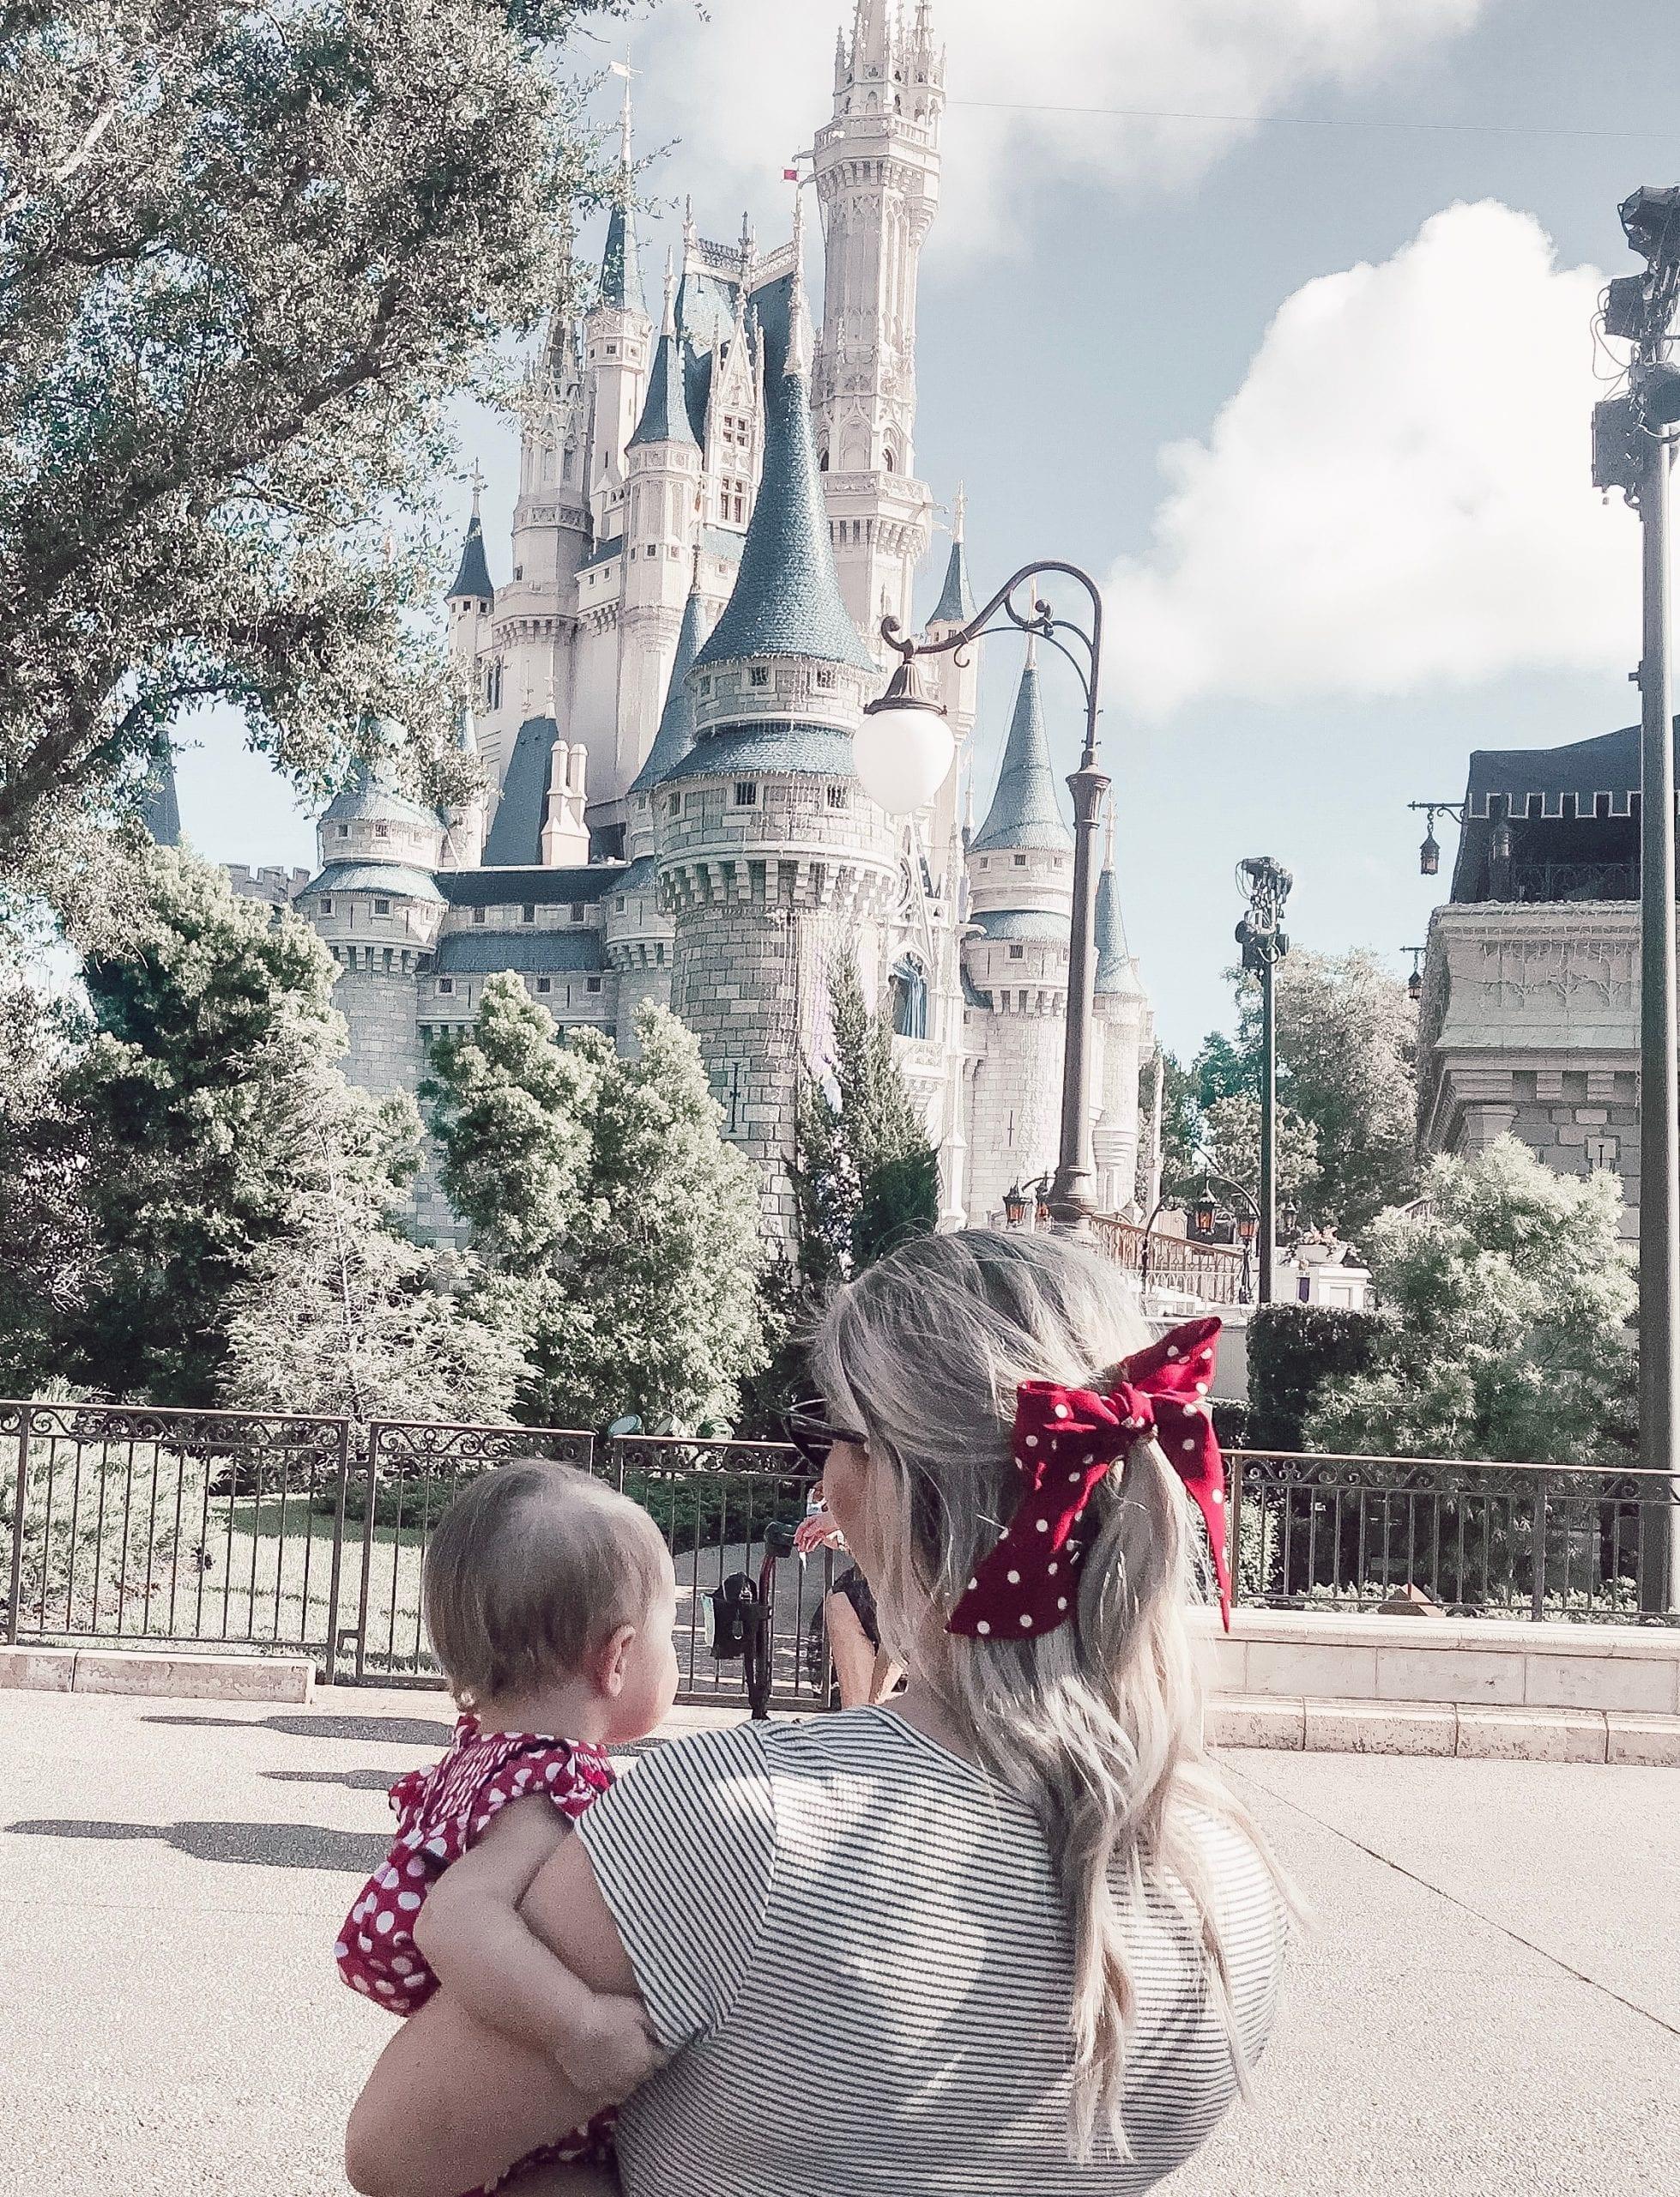 mom and me at the Magic Kingdom Walt Disney World